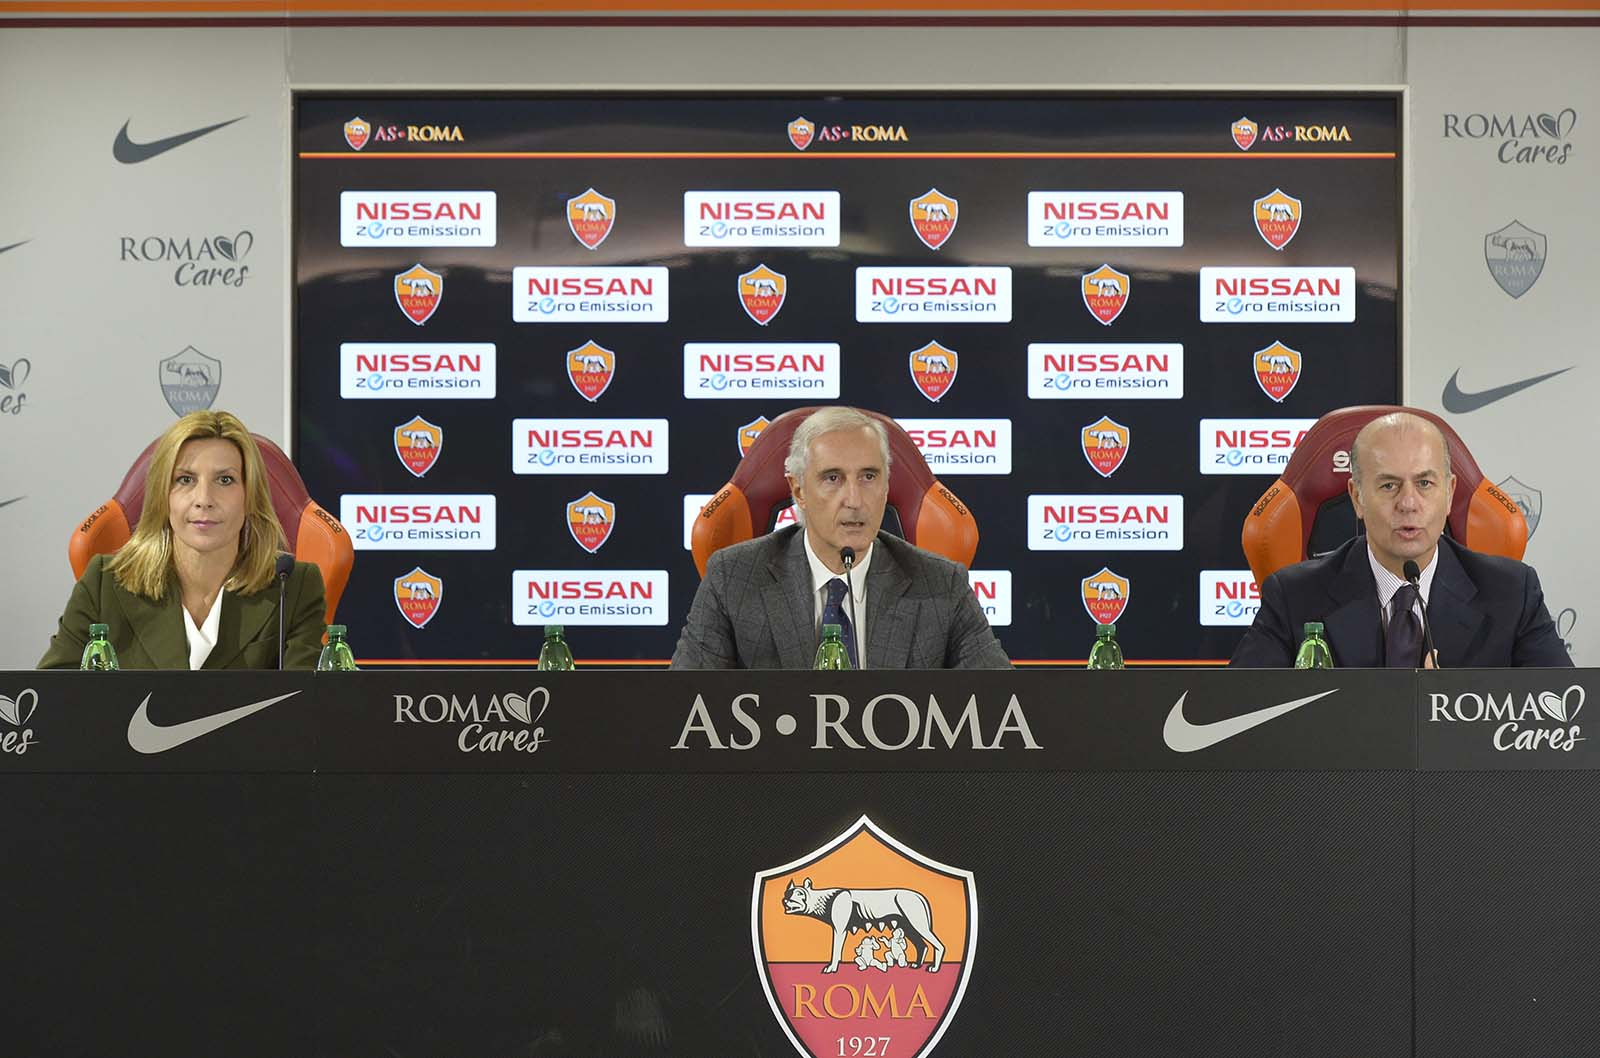 as-roma-nissan-sponsorship-deal